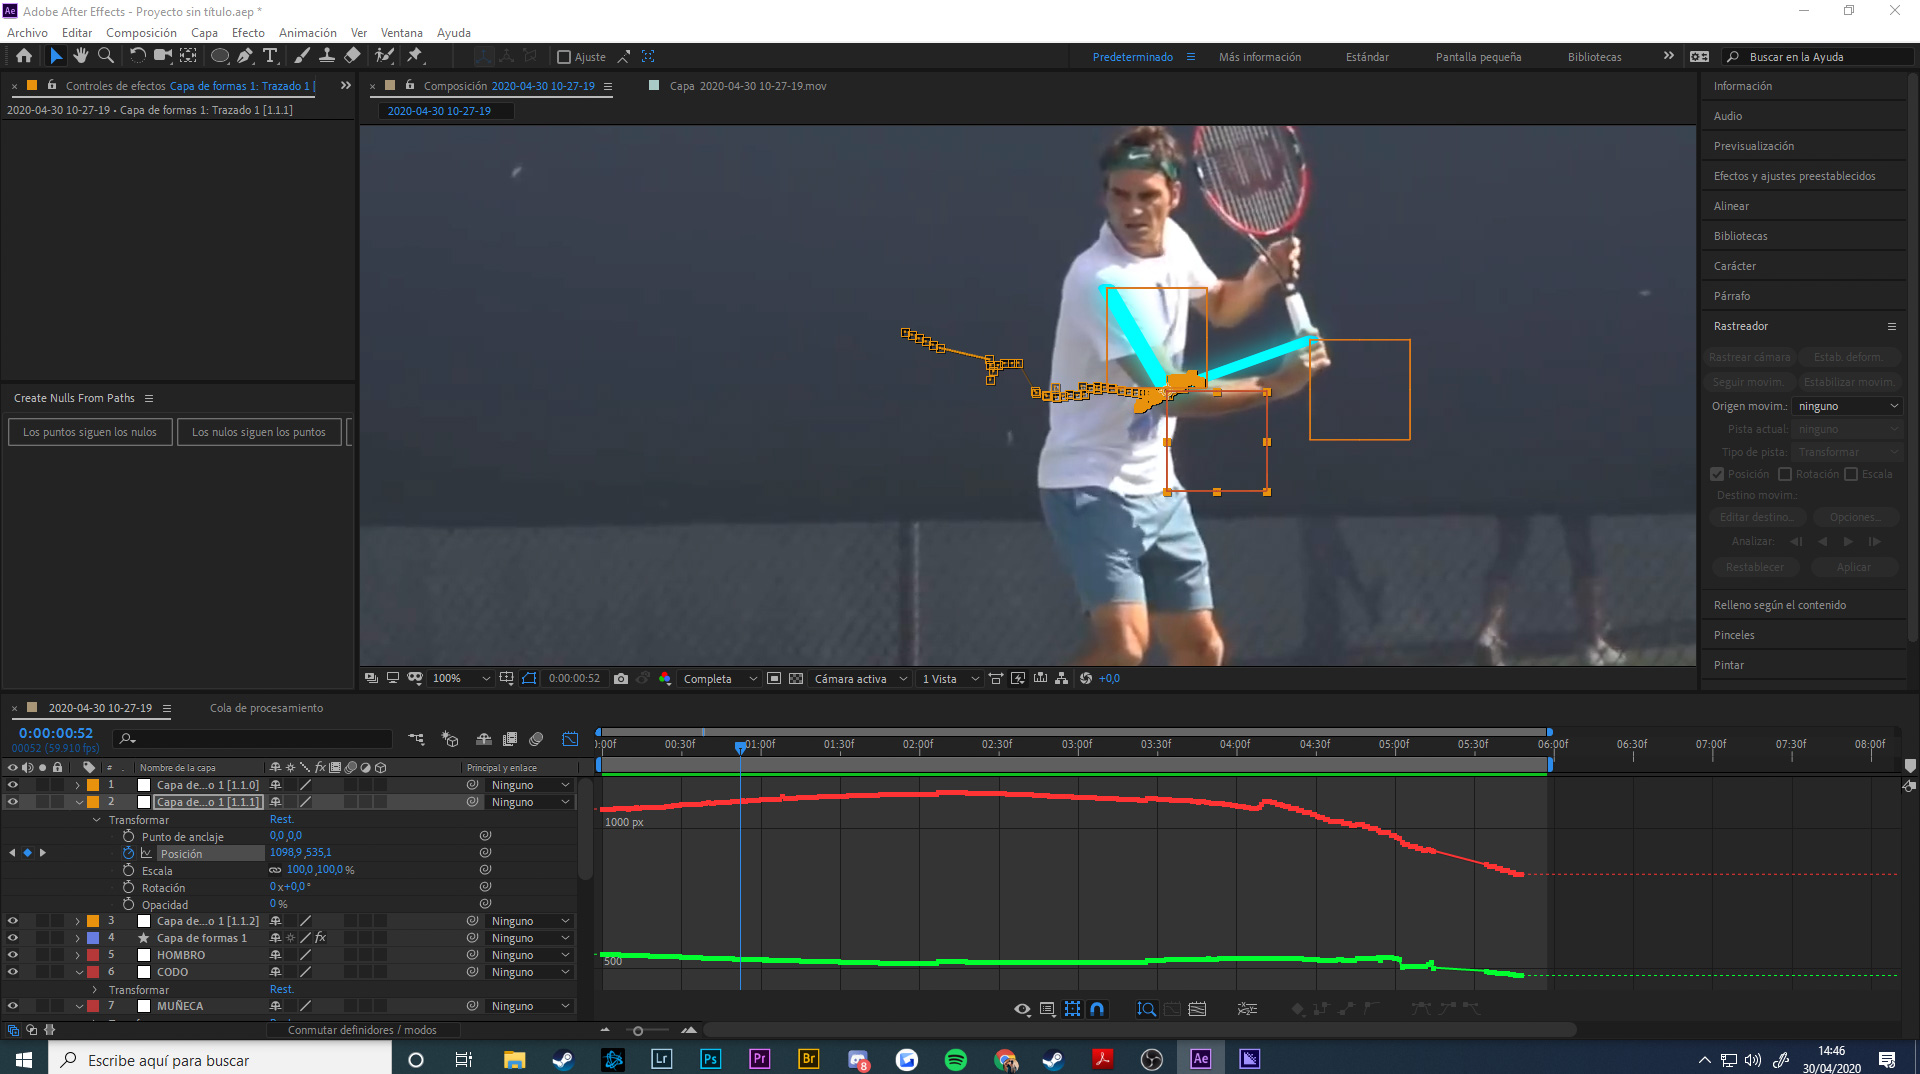 Federer videoanalisis